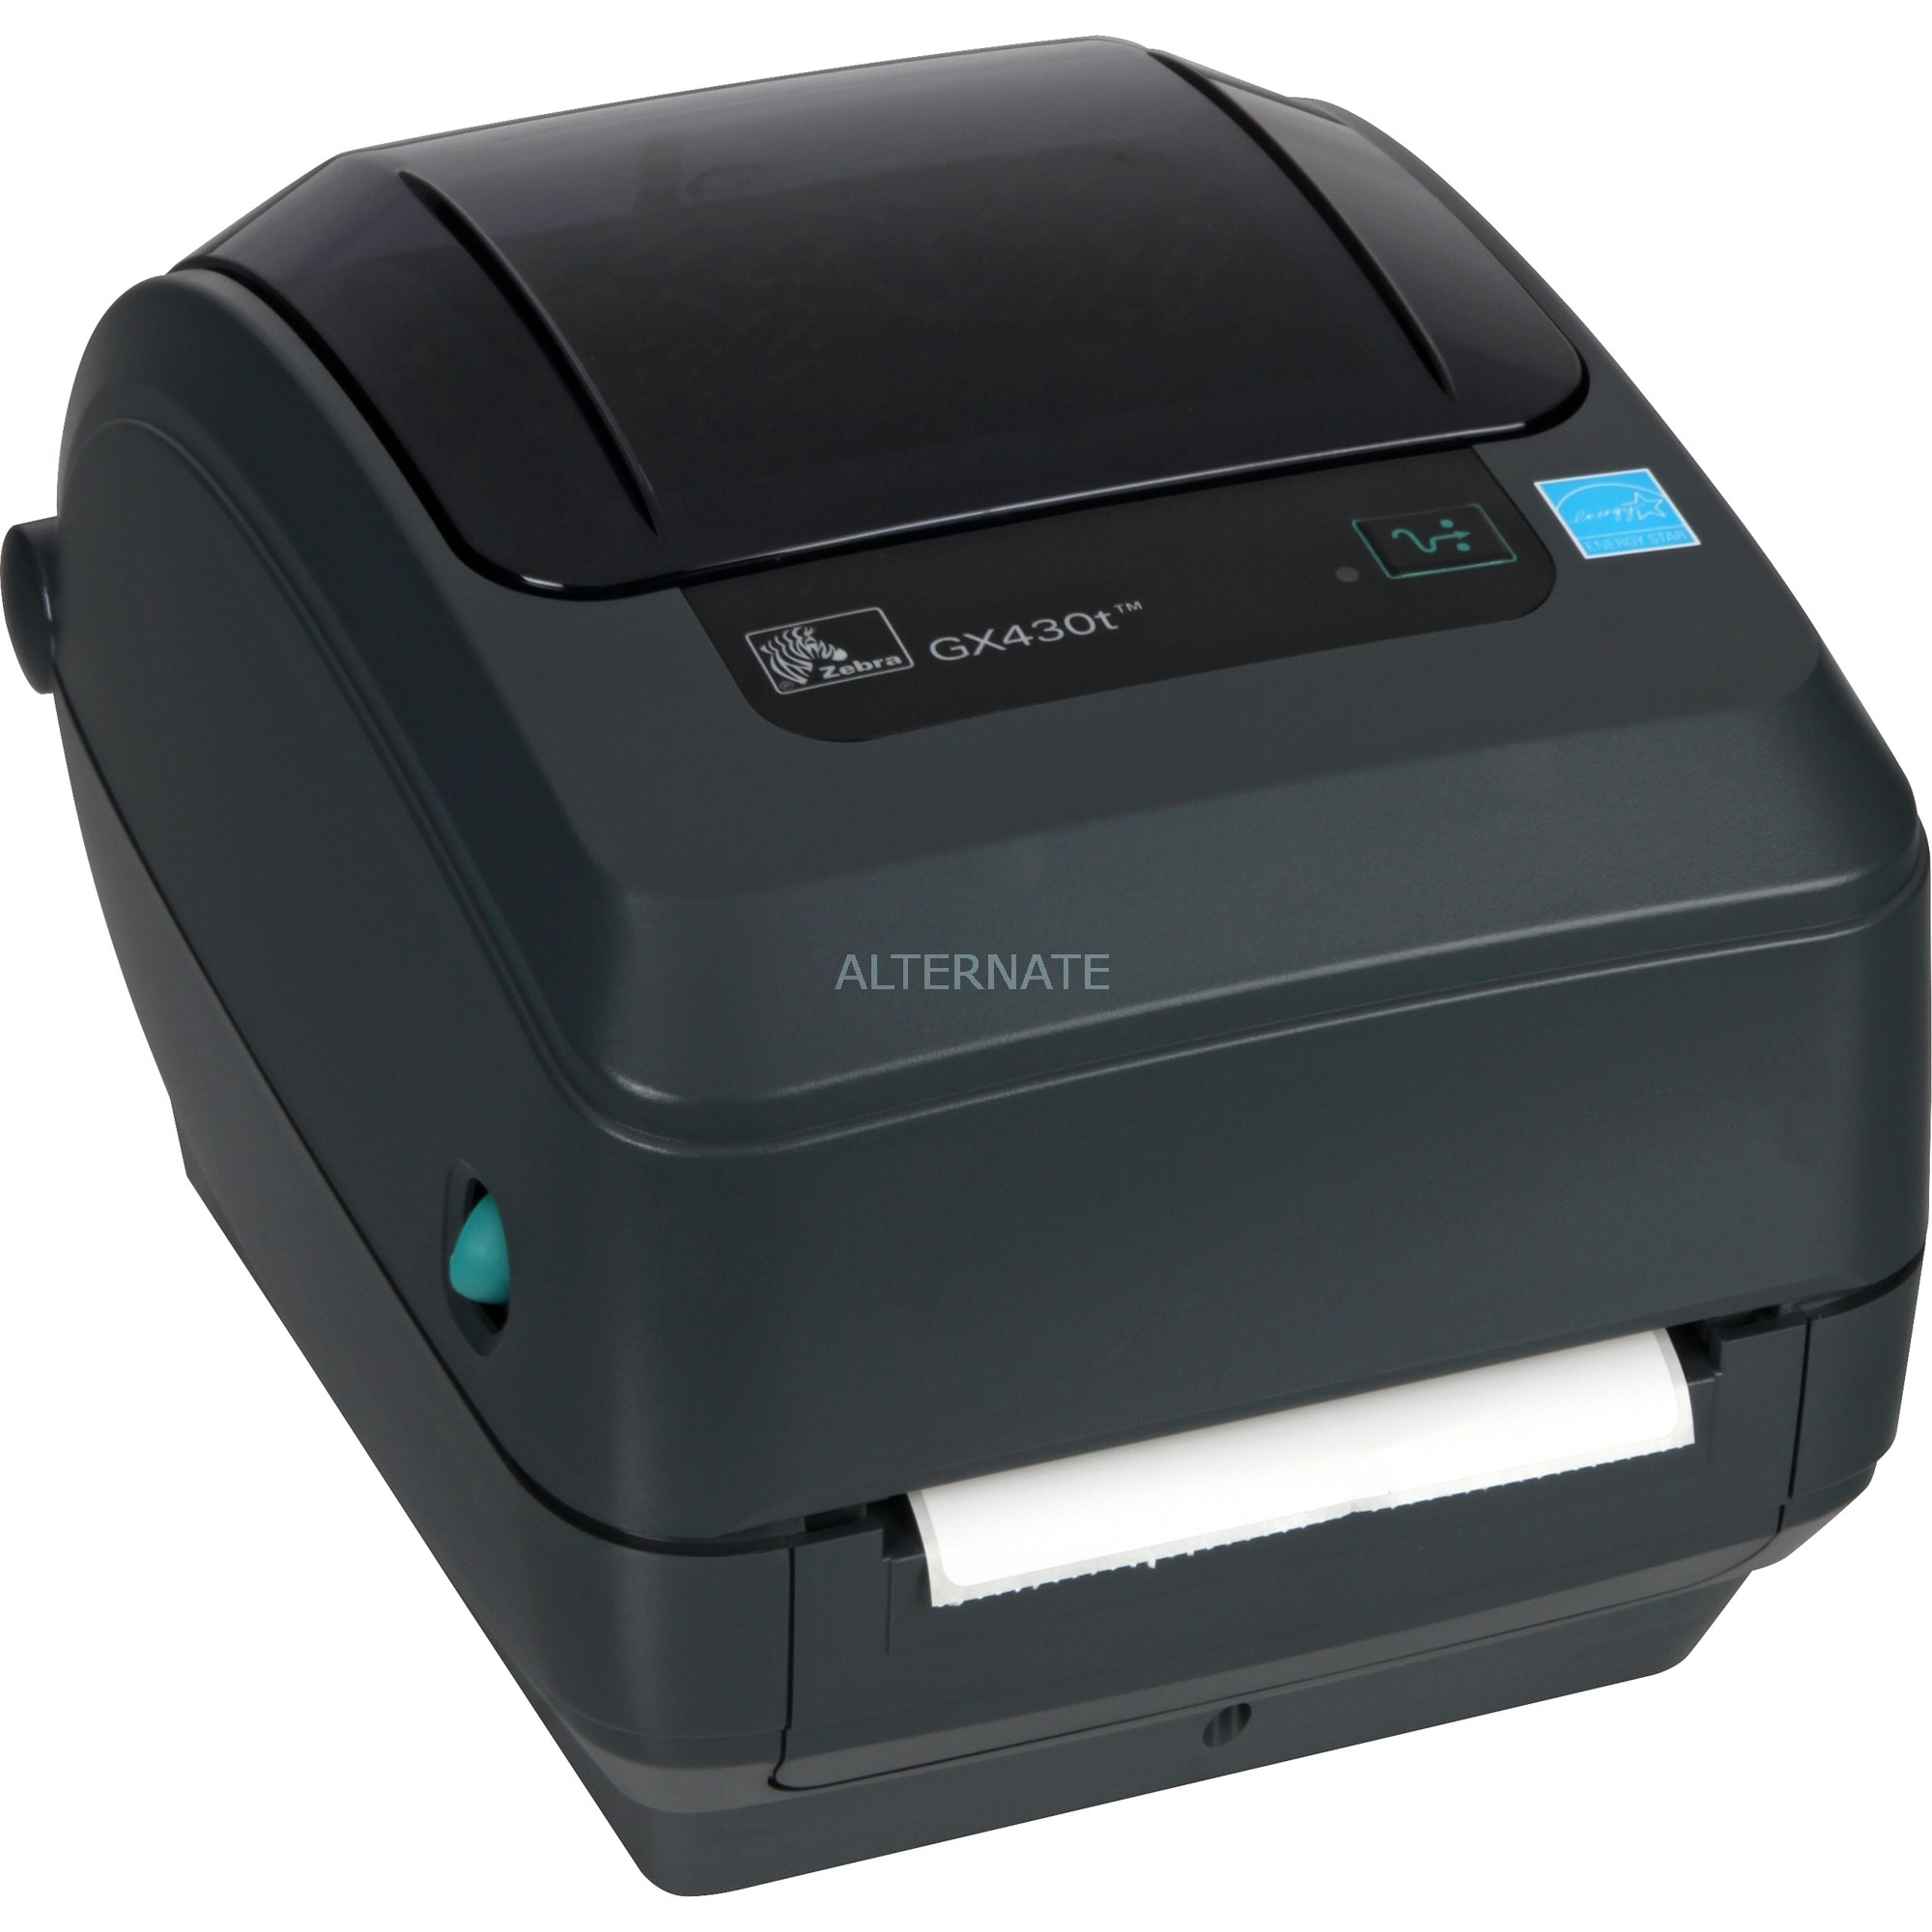 GX430t impresora de etiquetas Transferencia térmica 300 x 300 DPI Alámbrico, Rotulador